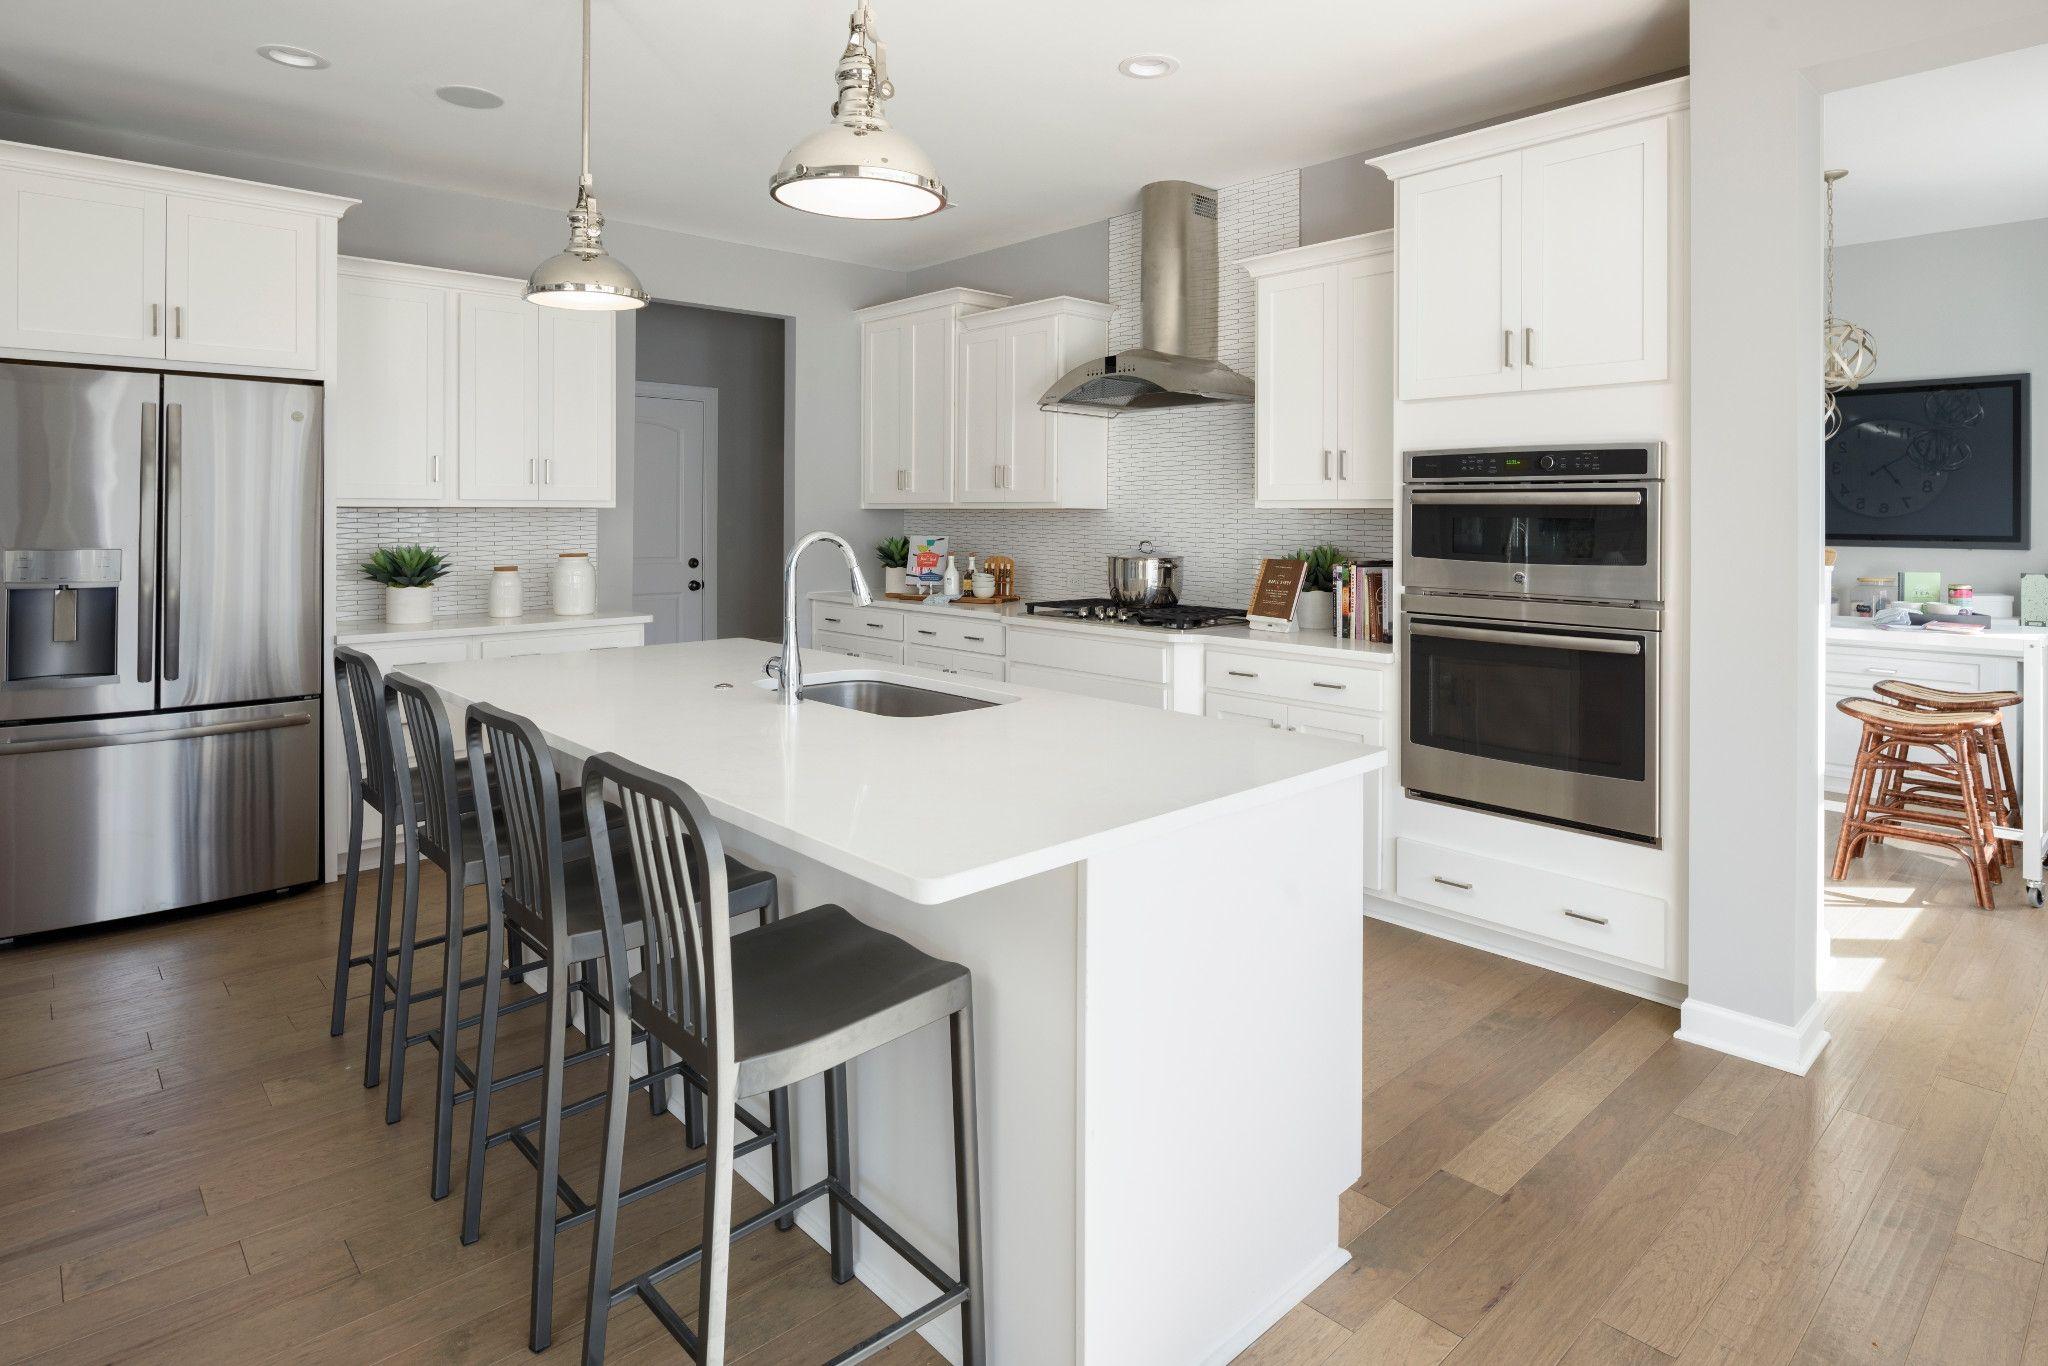 Kitchen-in-Cambridge-at-Sagewood-in-Matthews